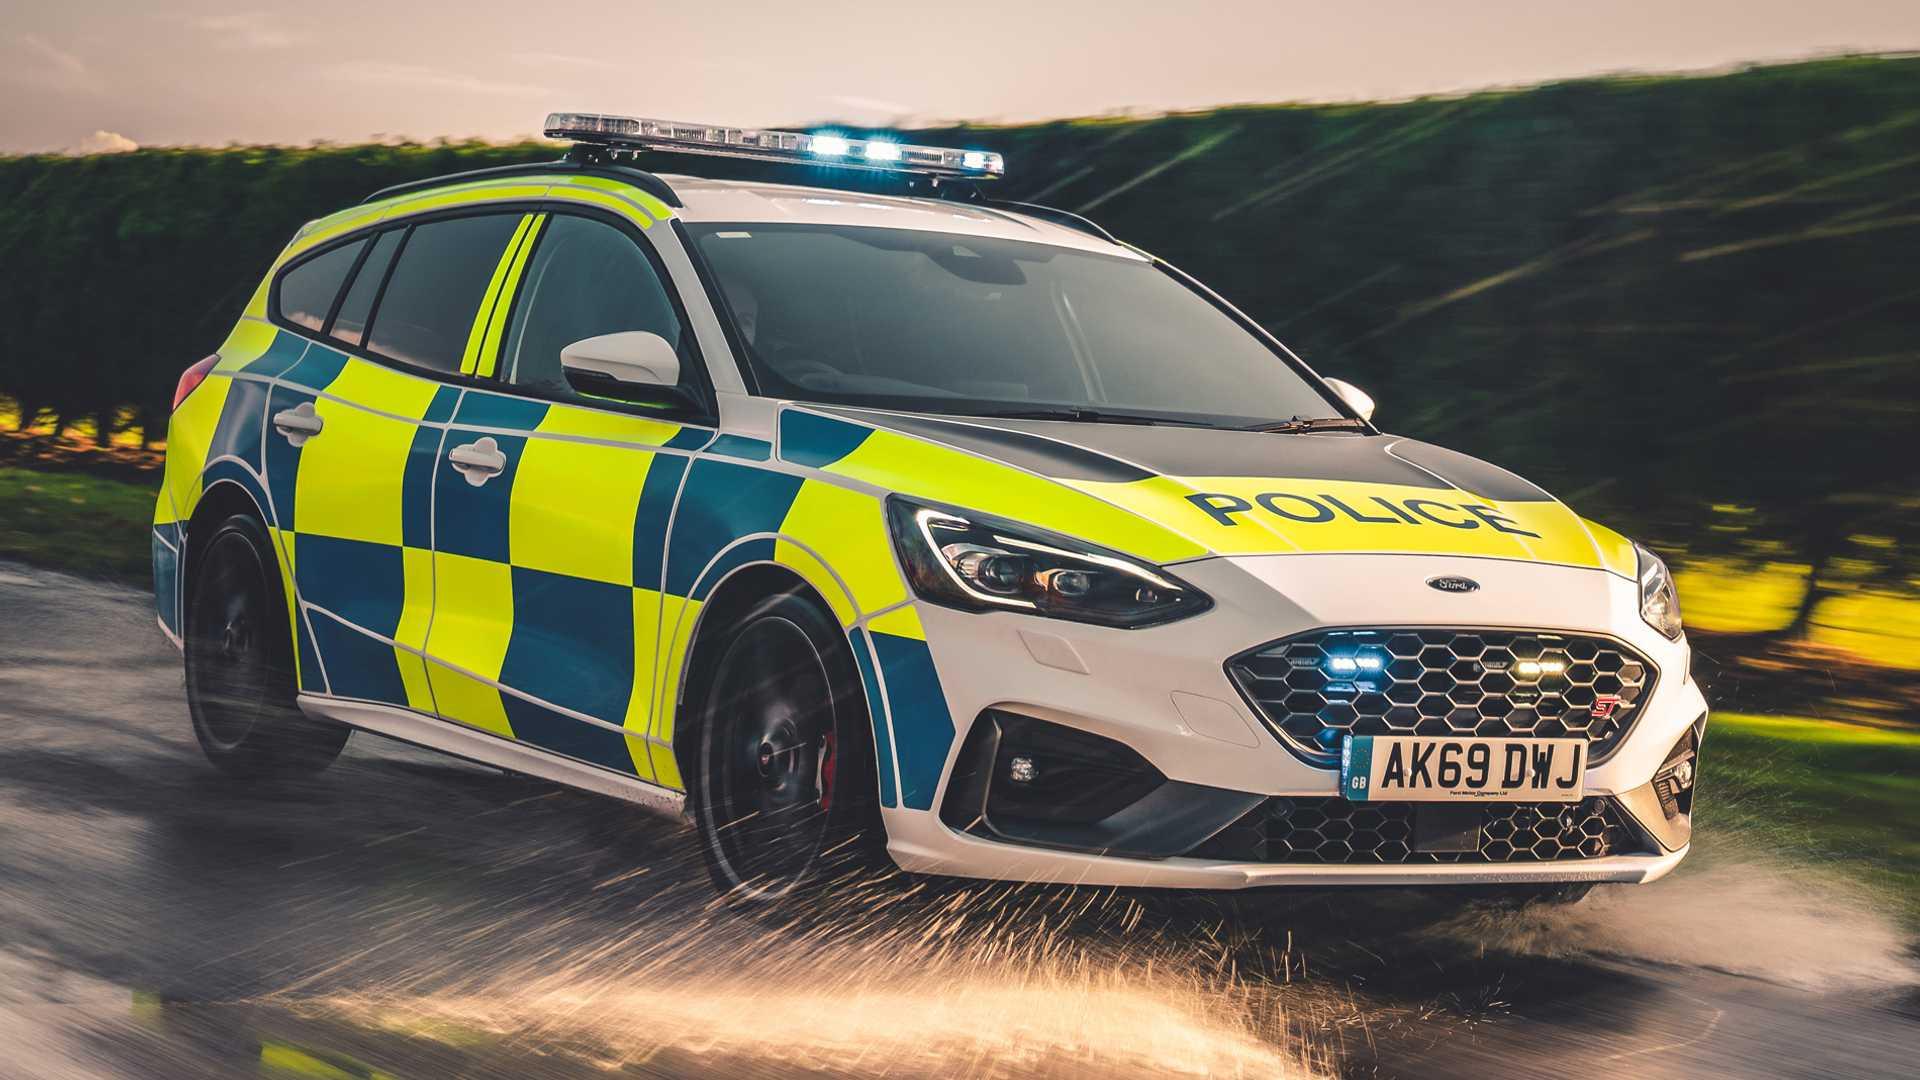 Ford-Focus-ST-and-Ranger-Raptor-UK-police-cars-6